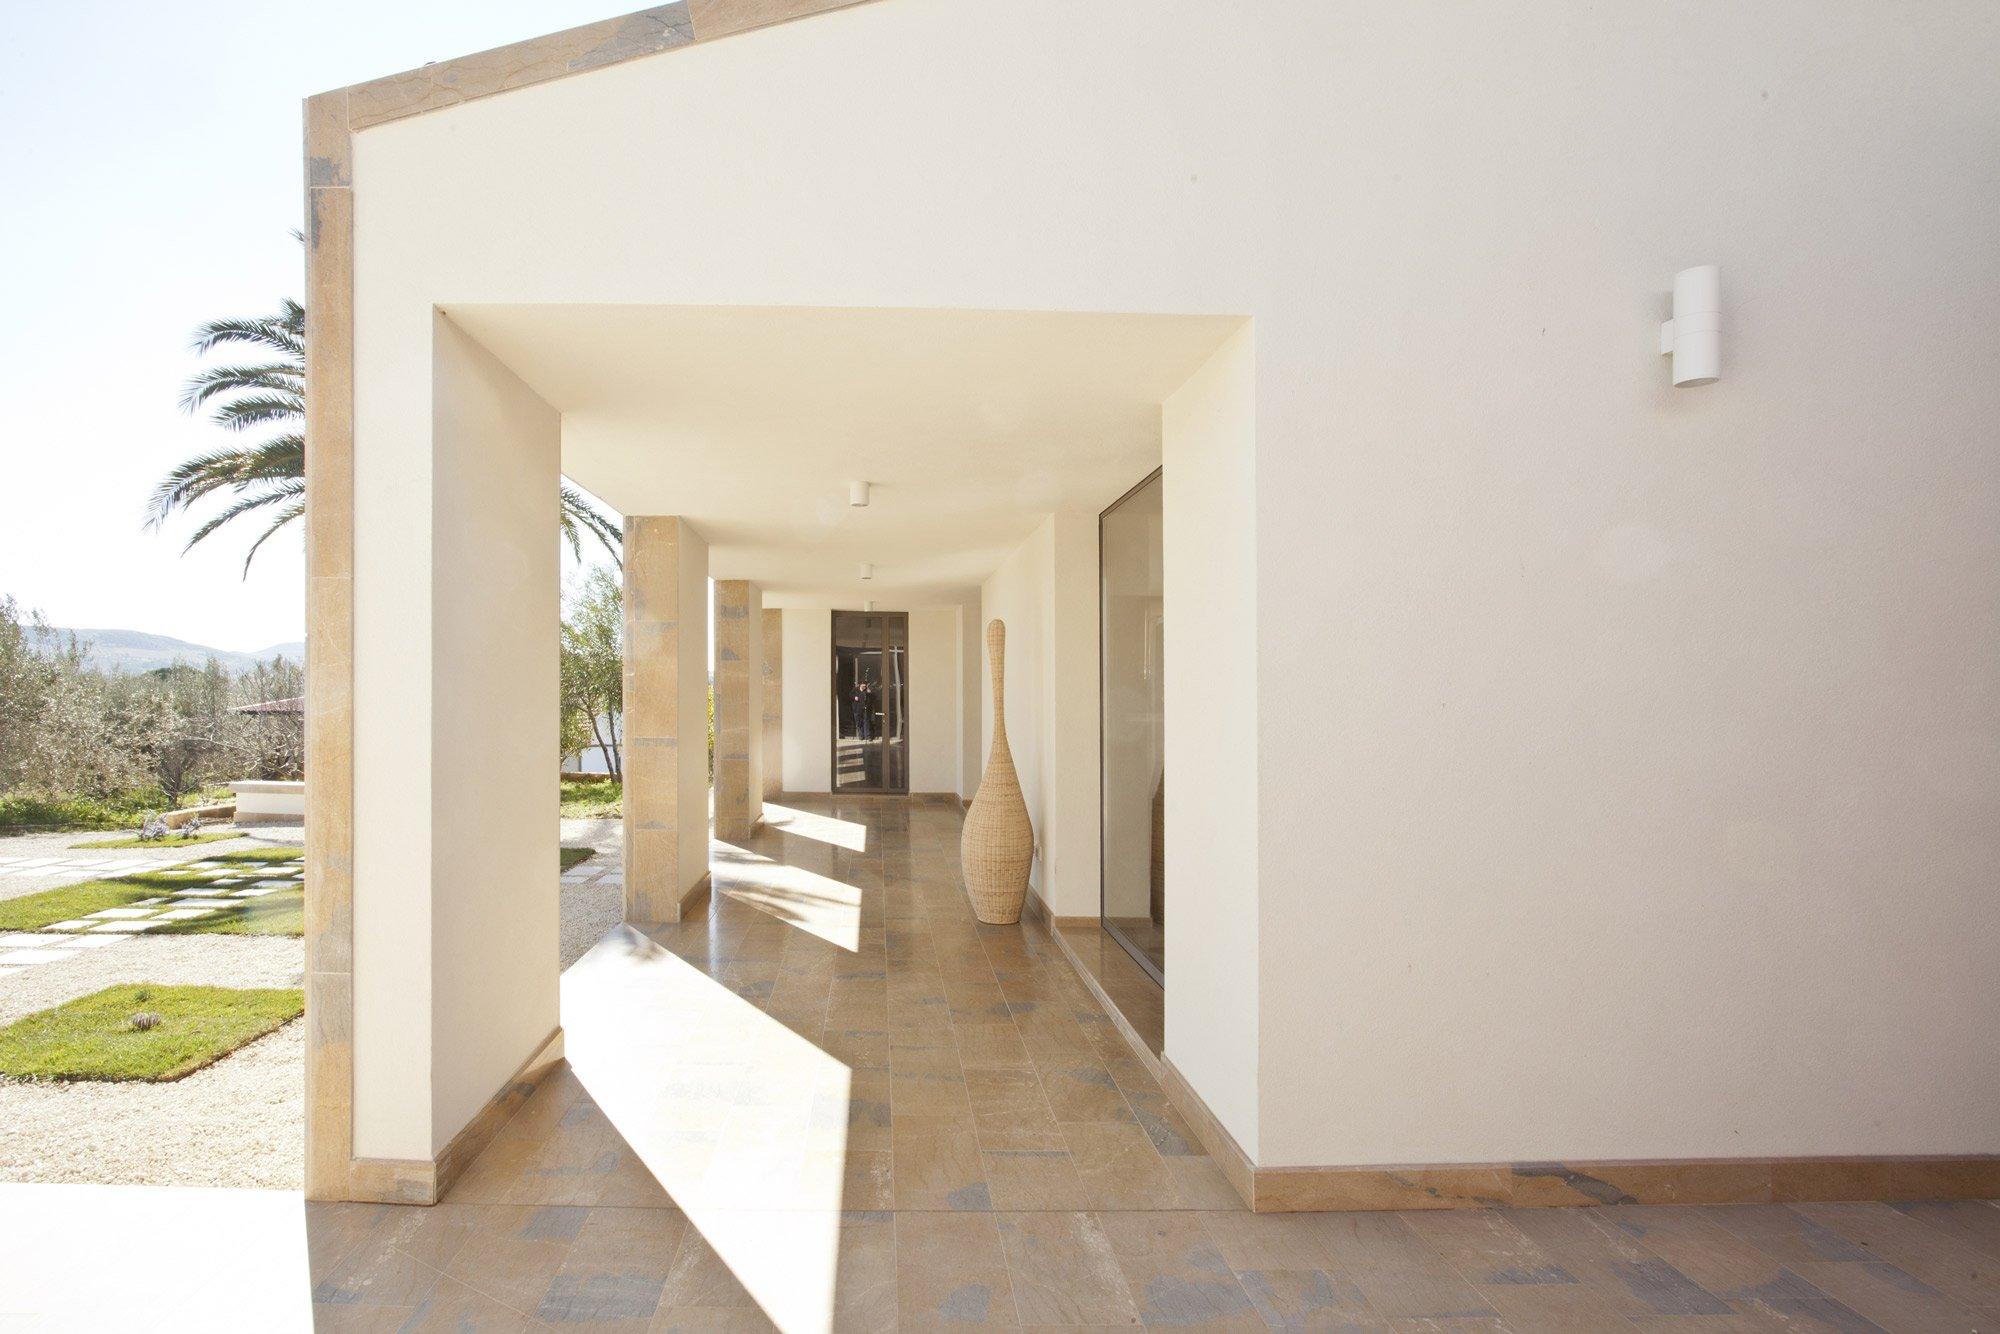 LFSN - Livio Ficarra Silvia Nardi Architetti |